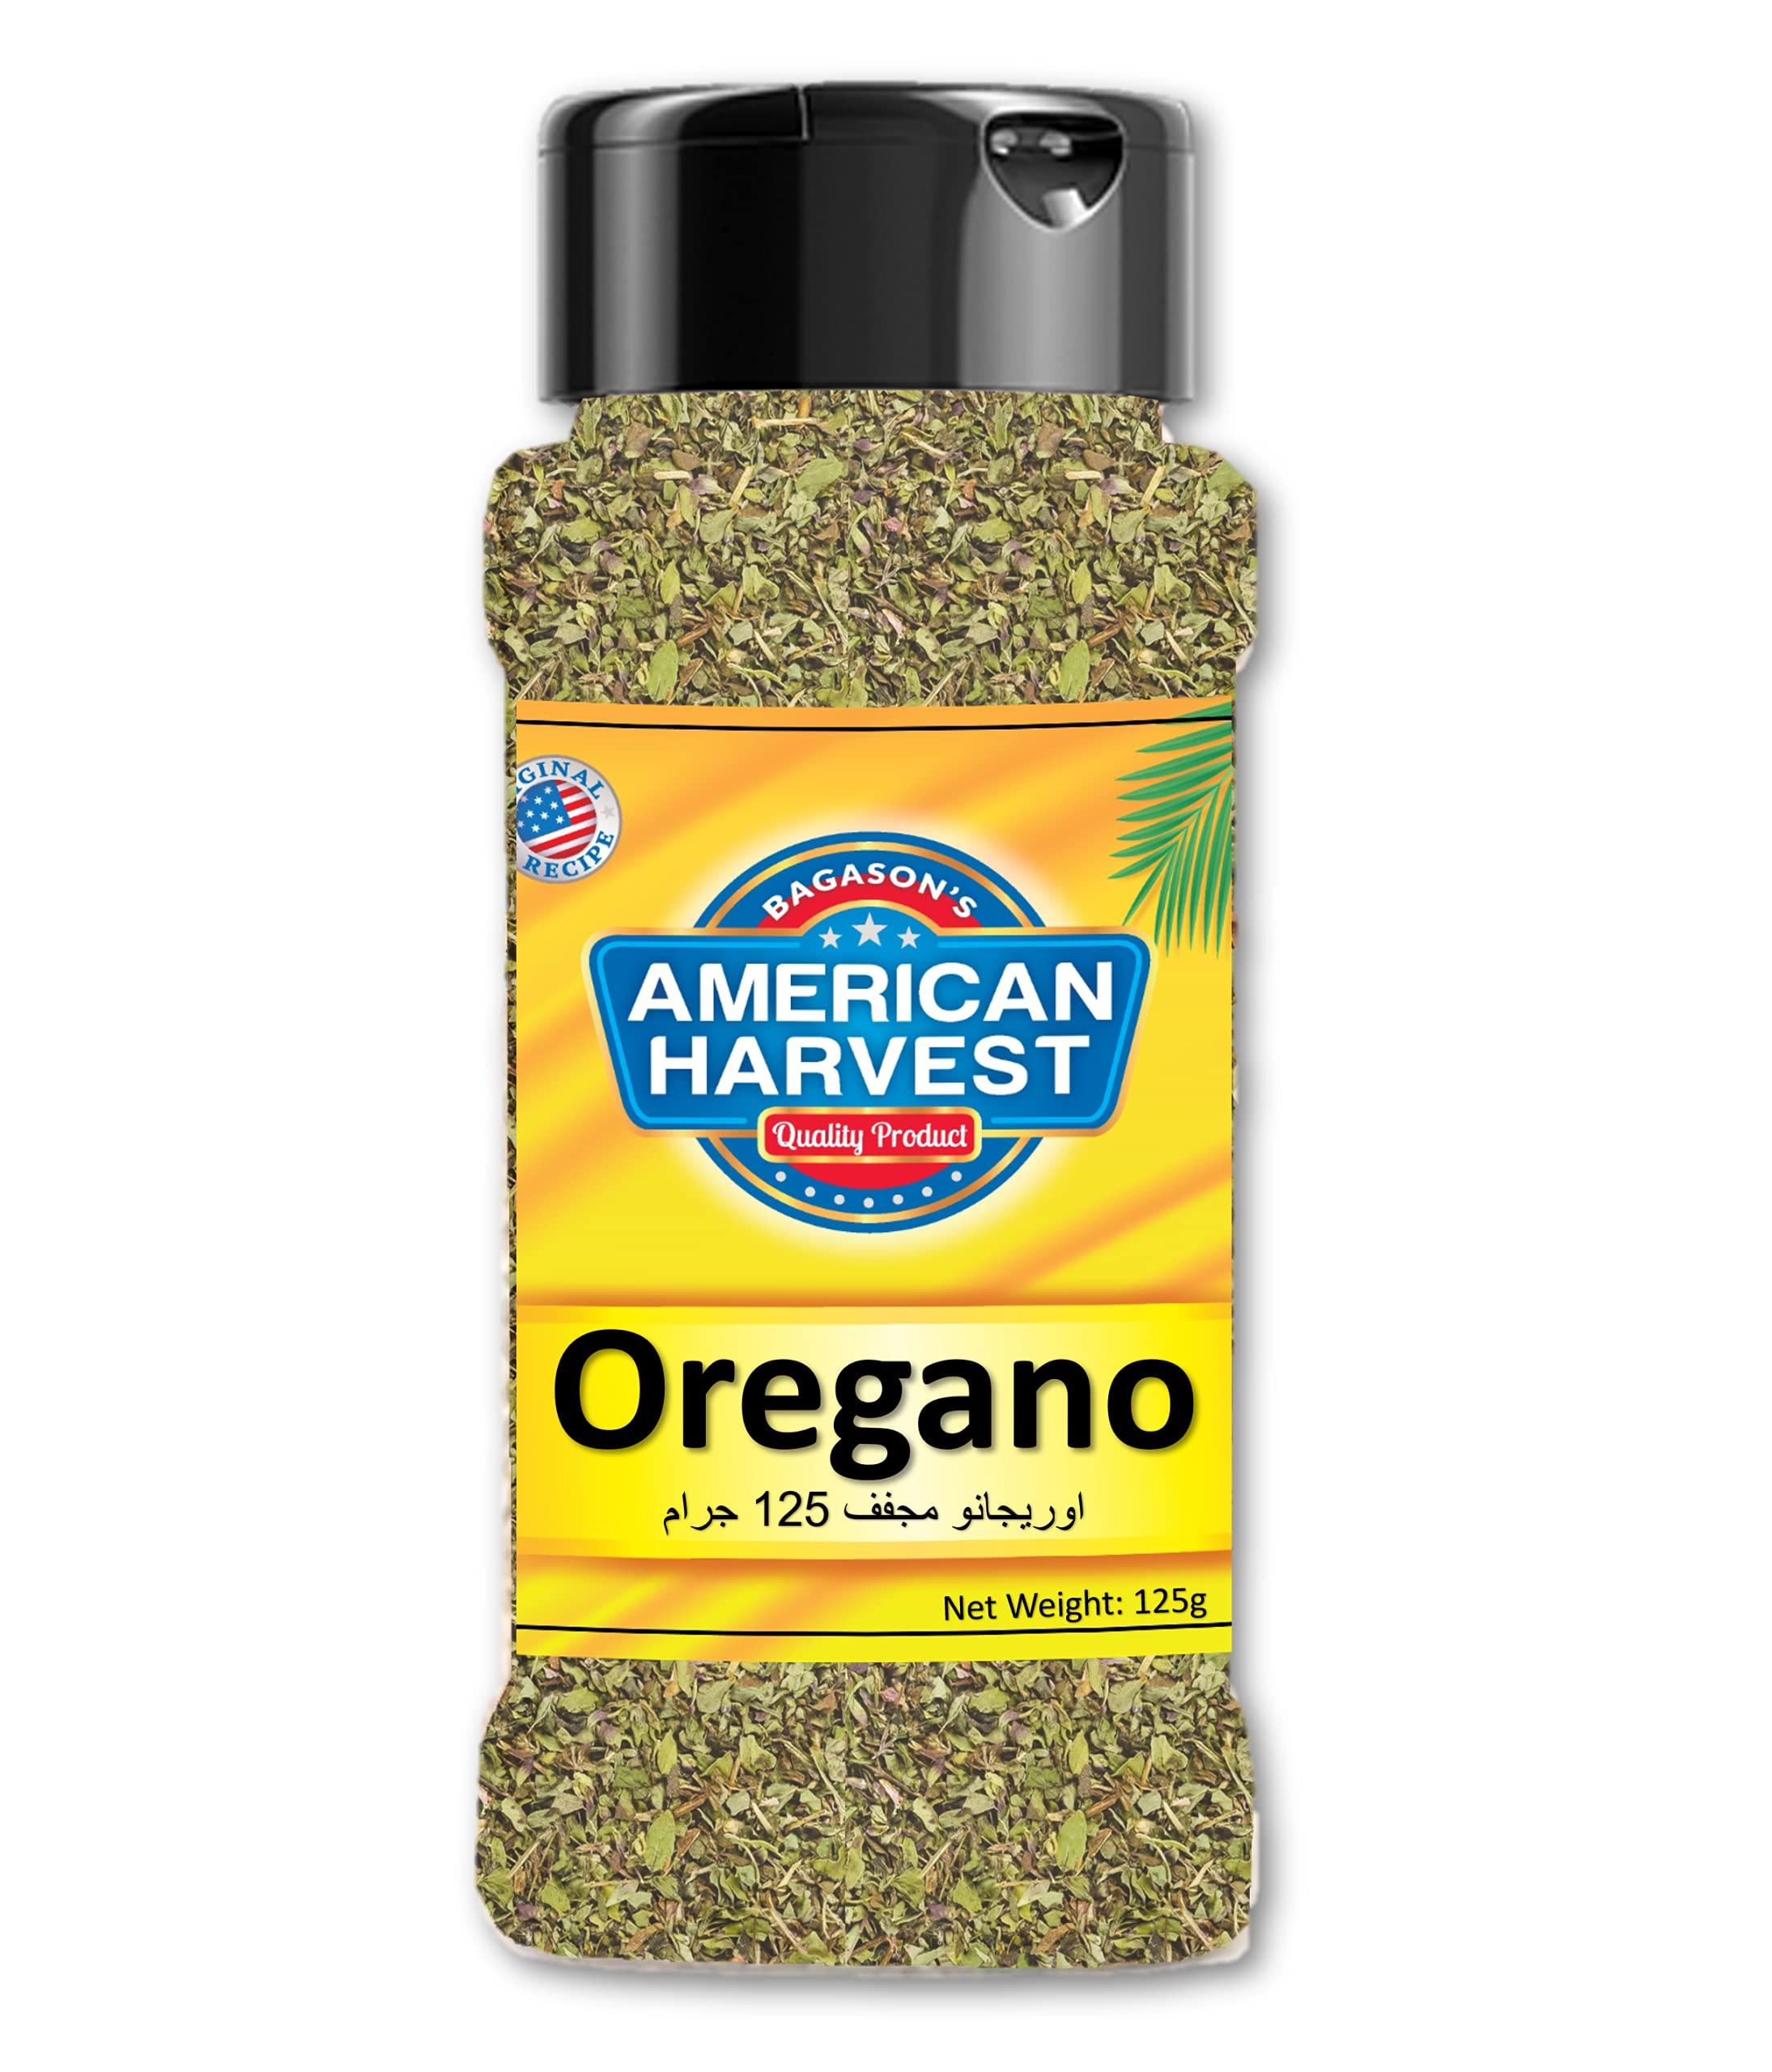 American Harvest Oregano Jar, 125 gm